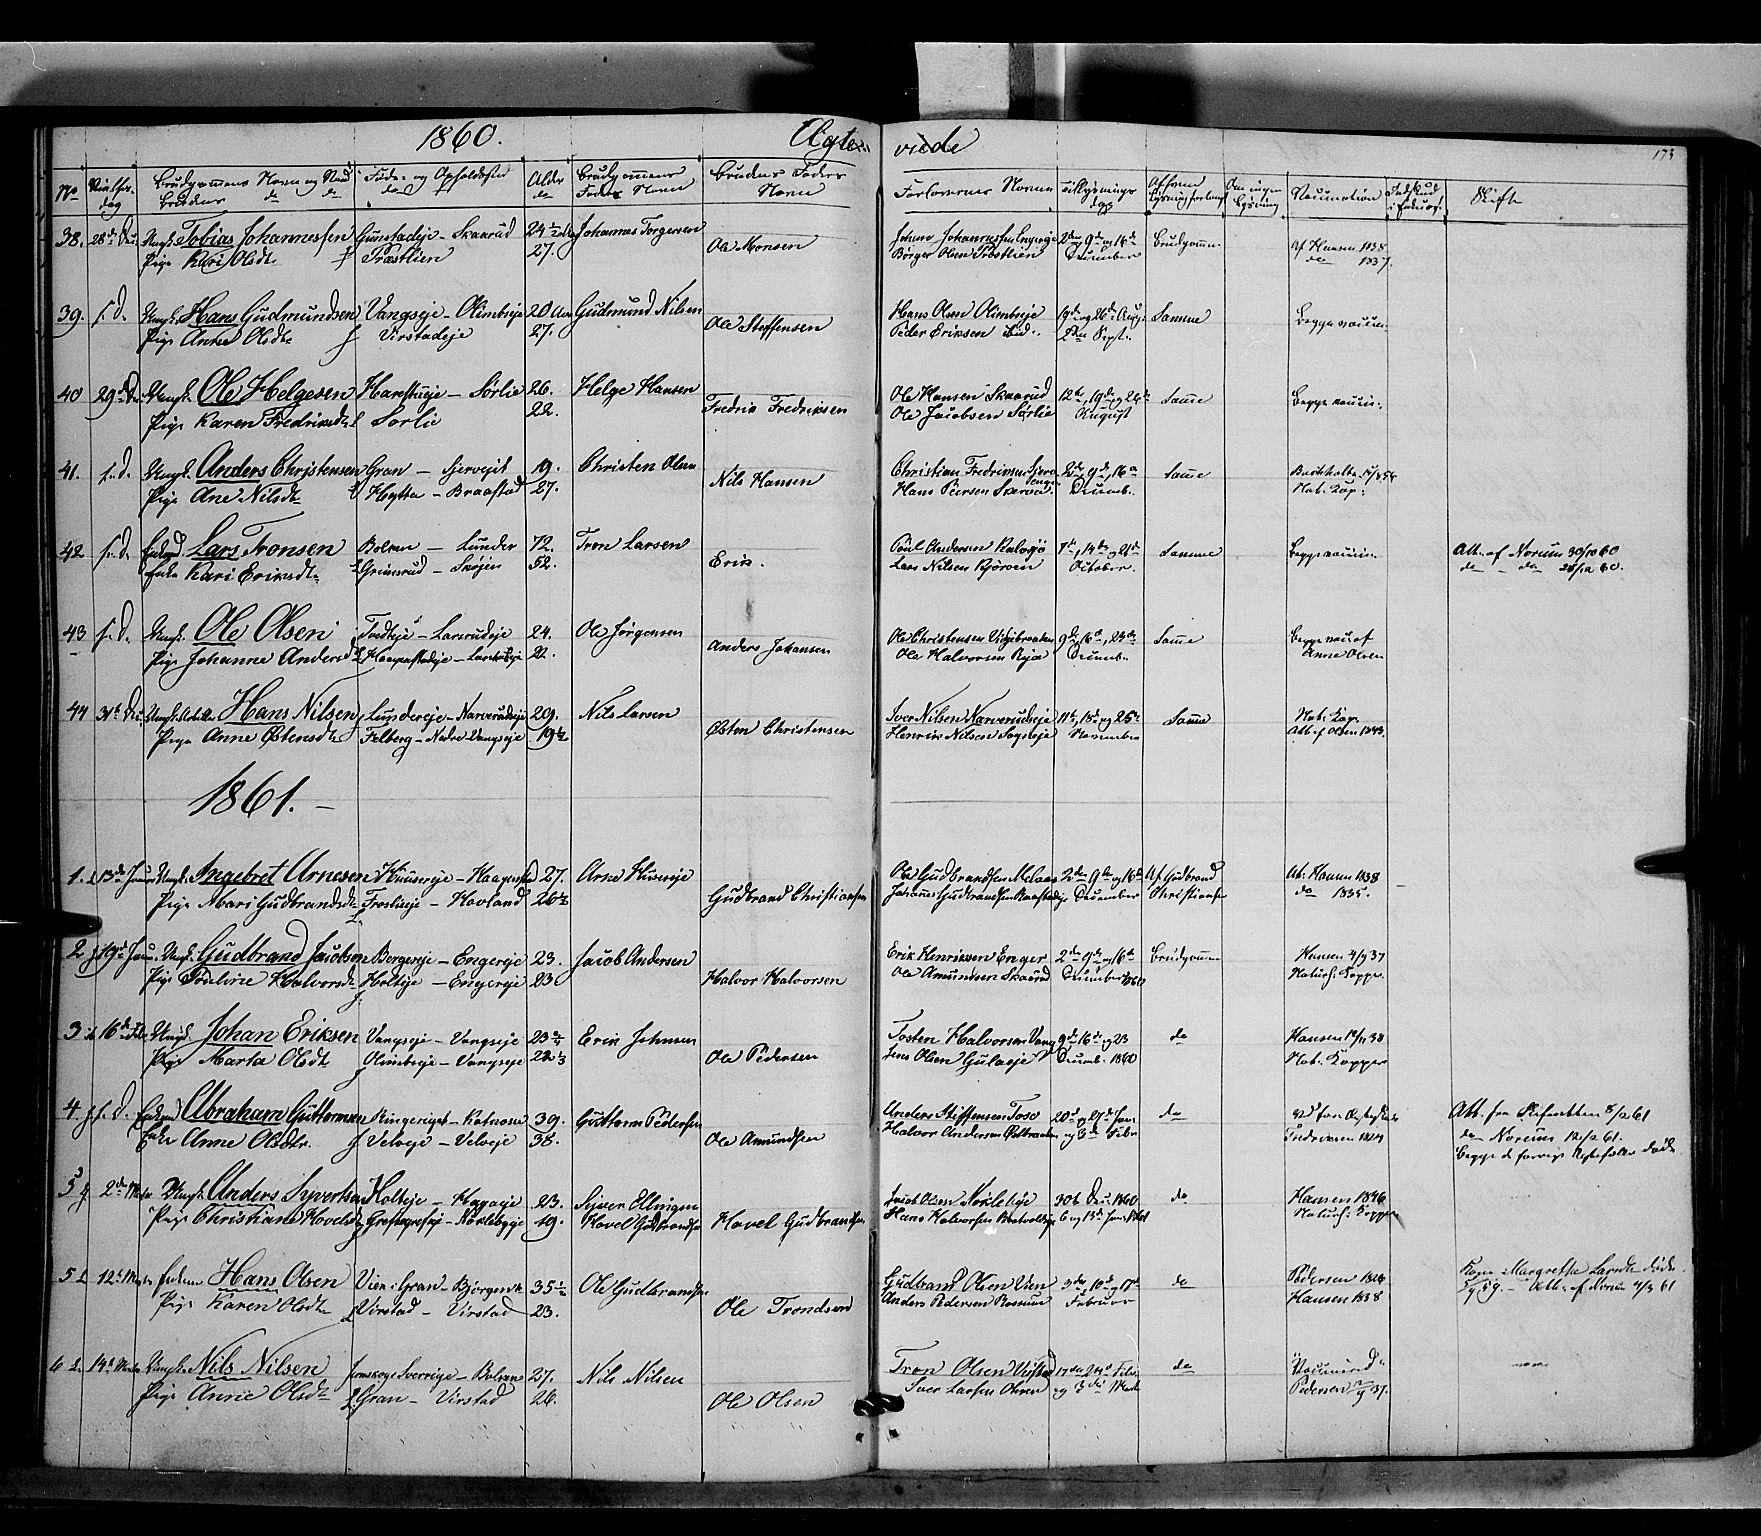 SAH, Jevnaker prestekontor, Ministerialbok nr. 7, 1858-1876, s. 173